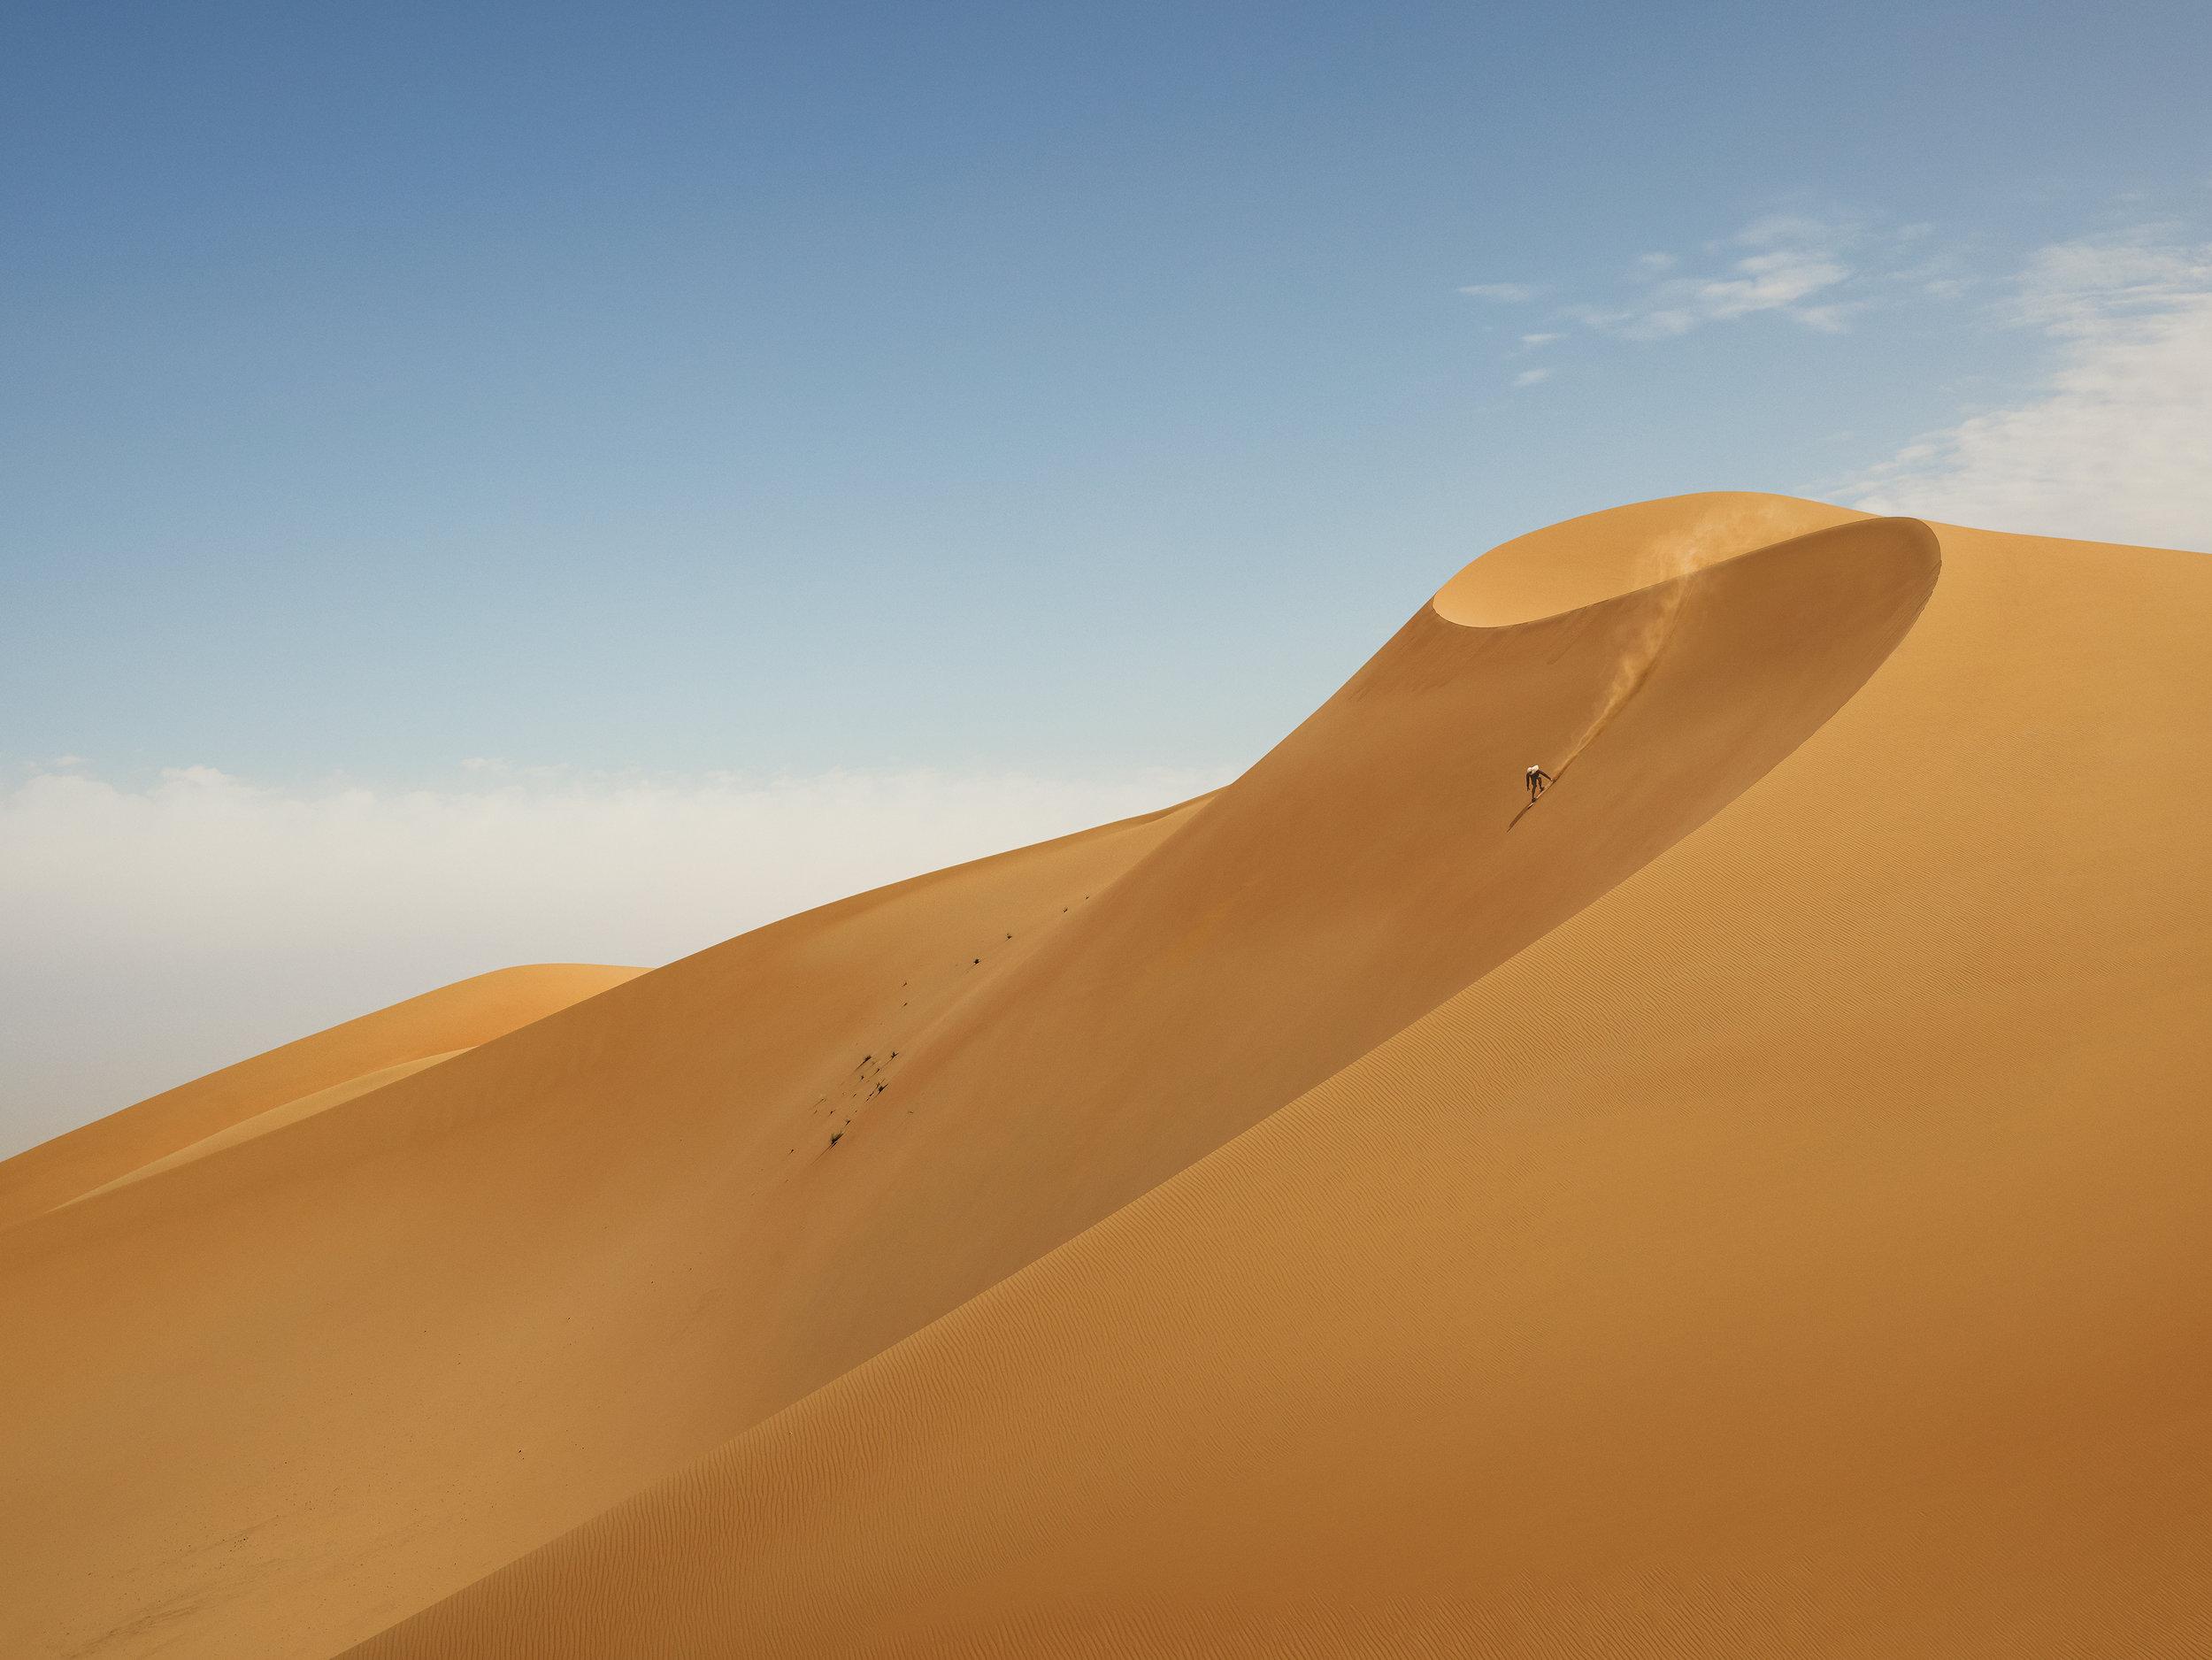 AbuDhabi_Day3_Sandboarding_0326_FINAL.jpg